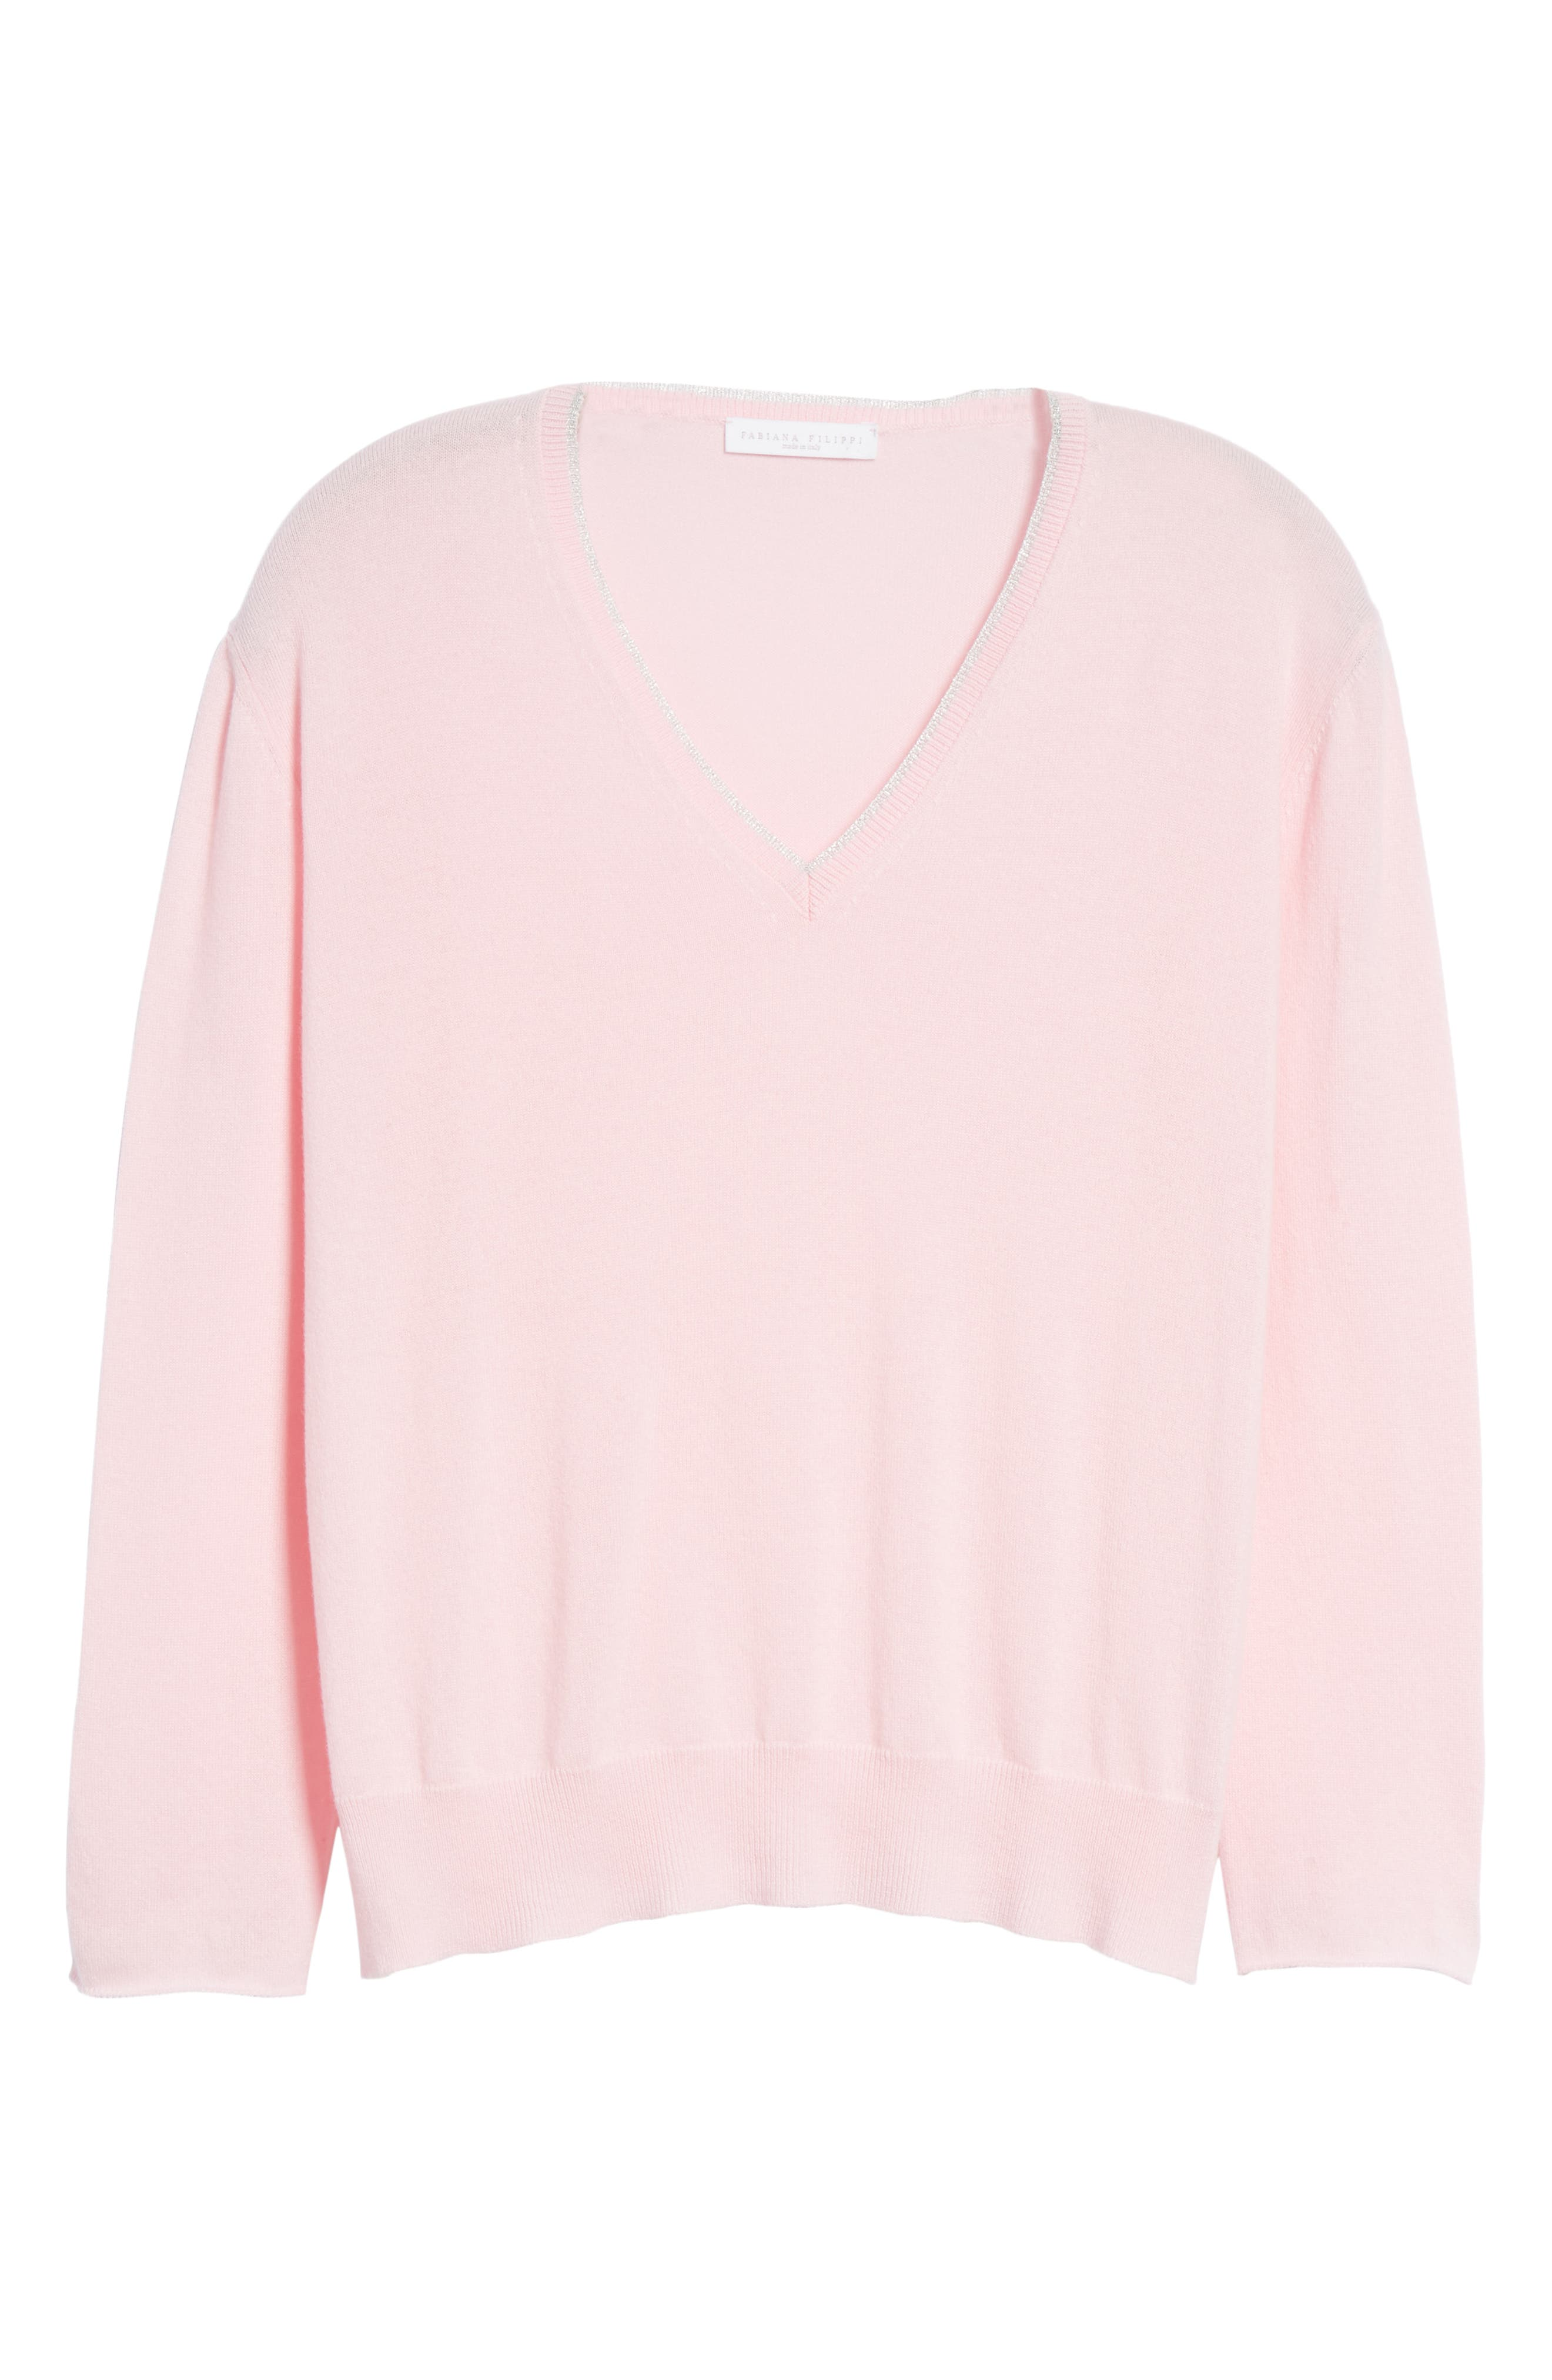 Metallic Trim Cashmere Sweater,                             Alternate thumbnail 6, color,                             PINK